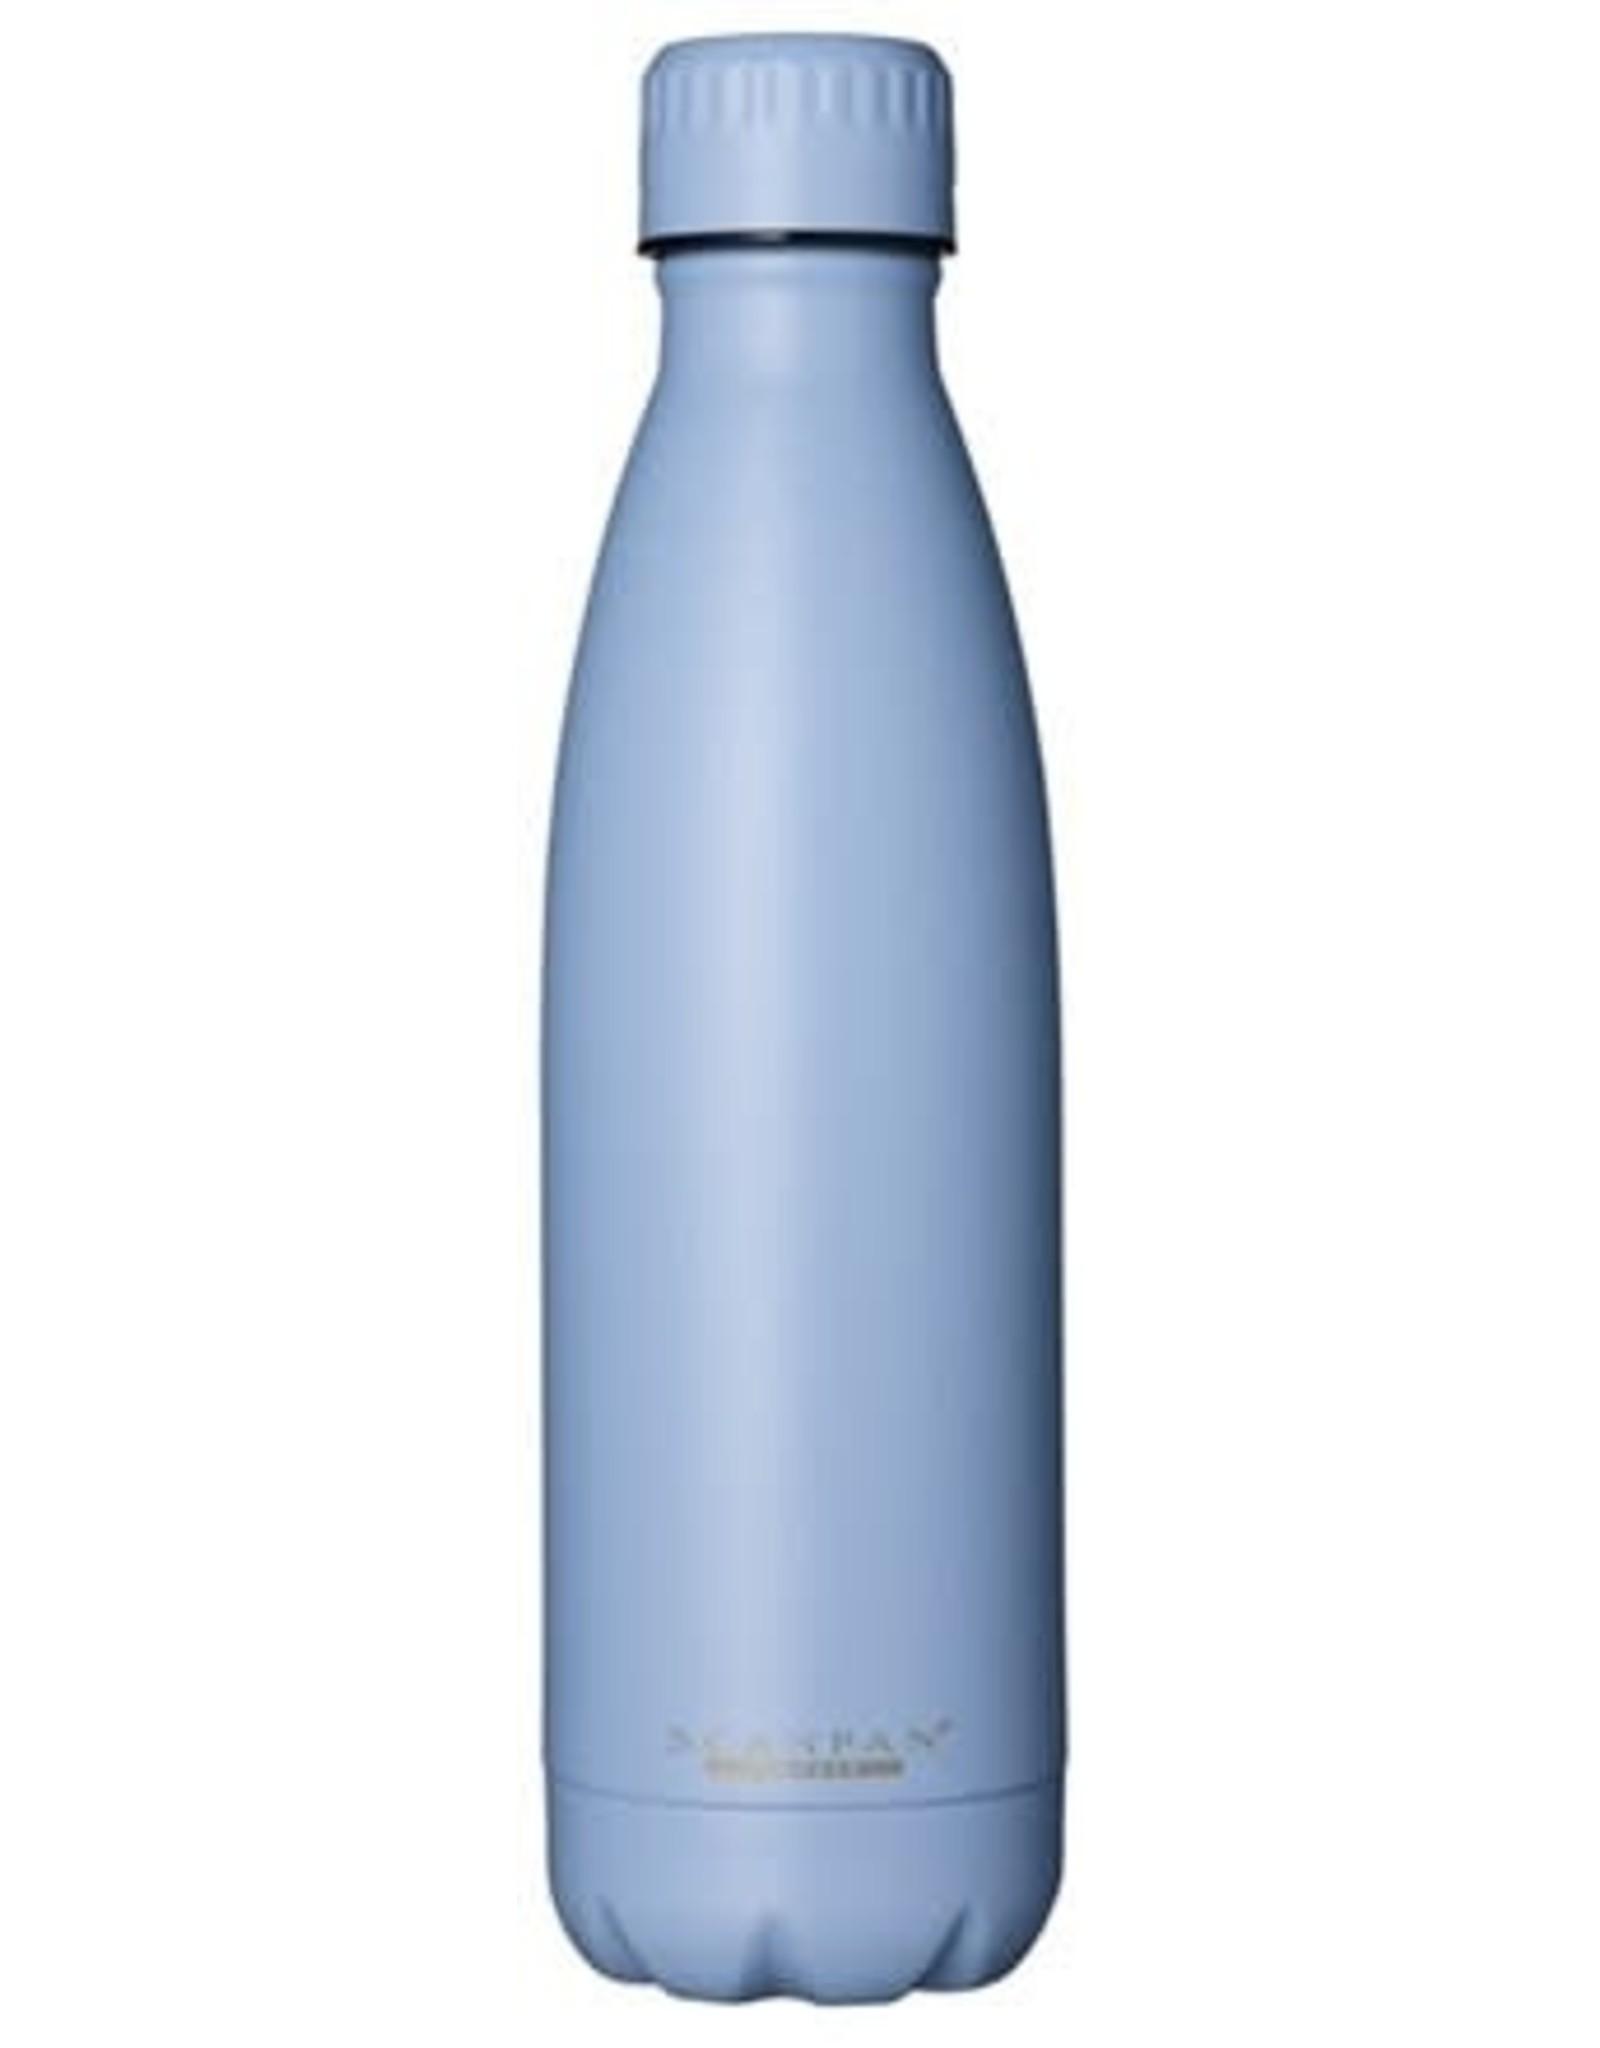 Scanpan Scanpan. 500 ml thermofles, Airy Blue, To GO